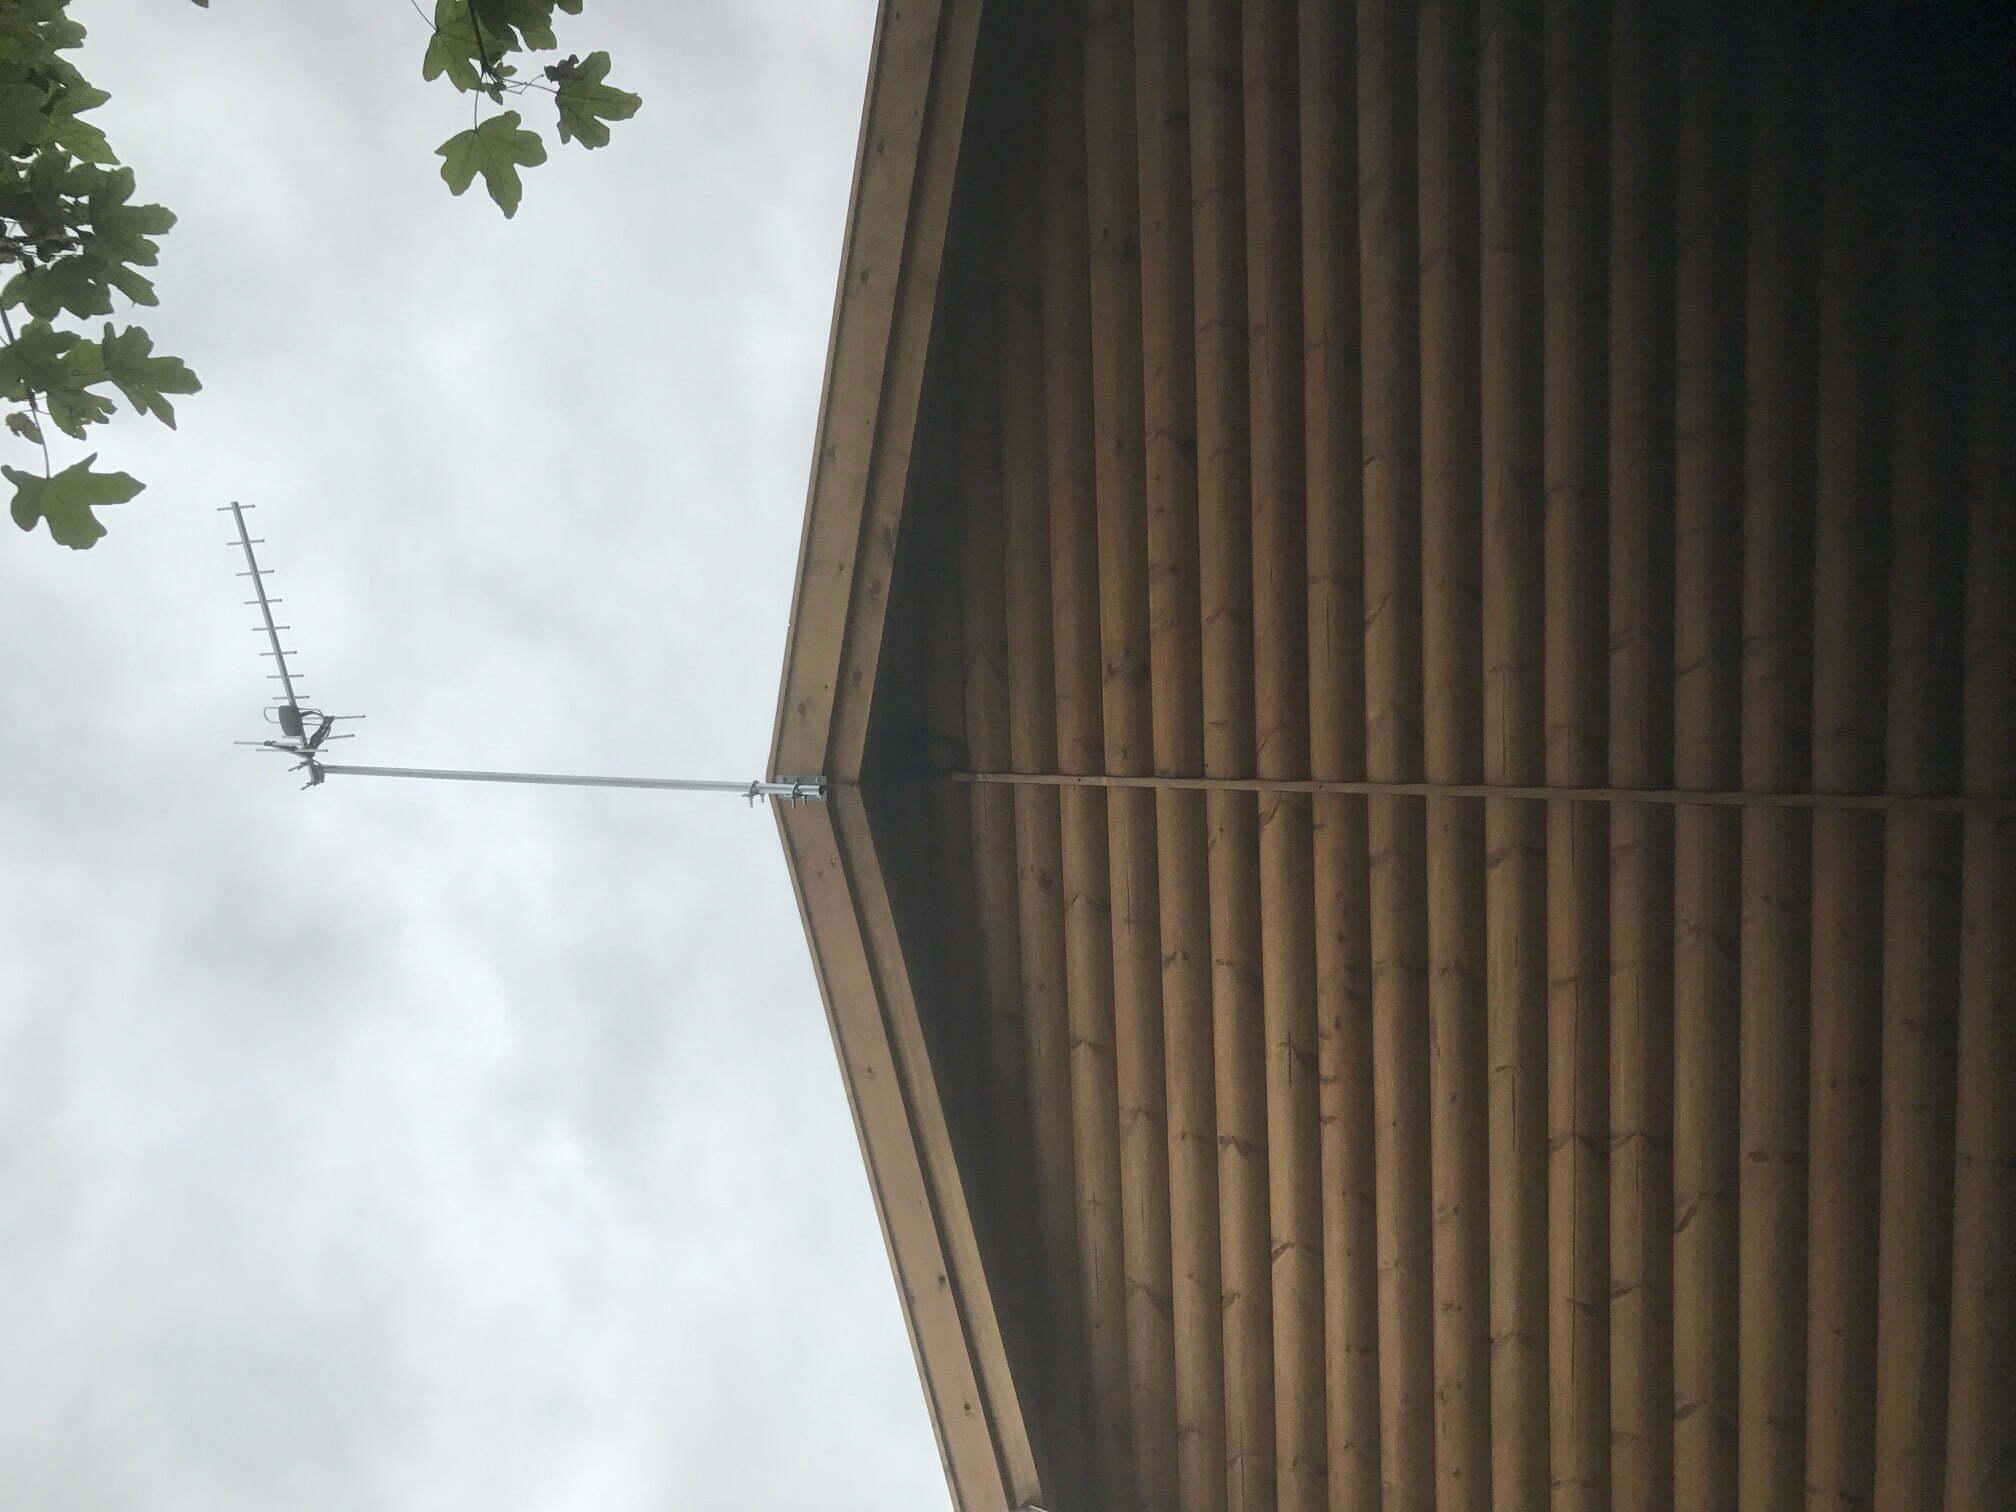 TV Aerials in Worcester